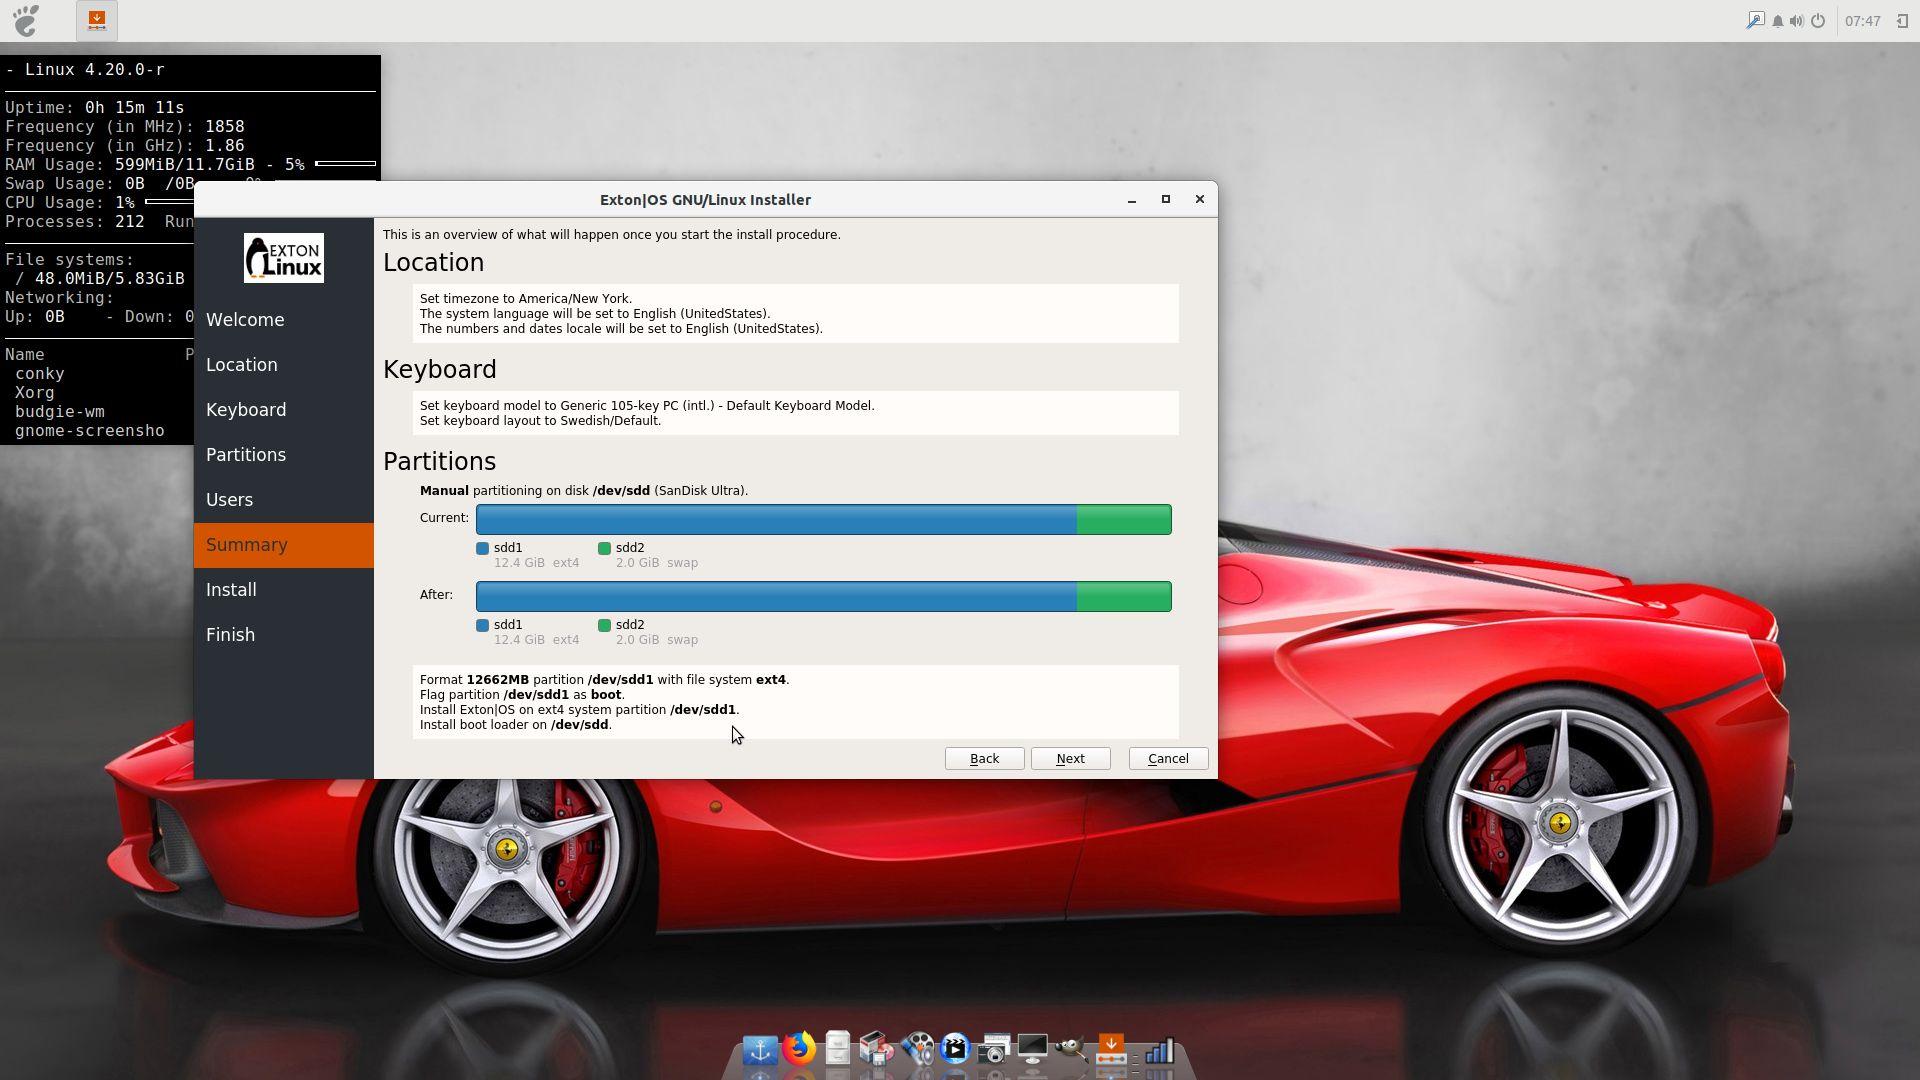 USB Install | Exton|OS